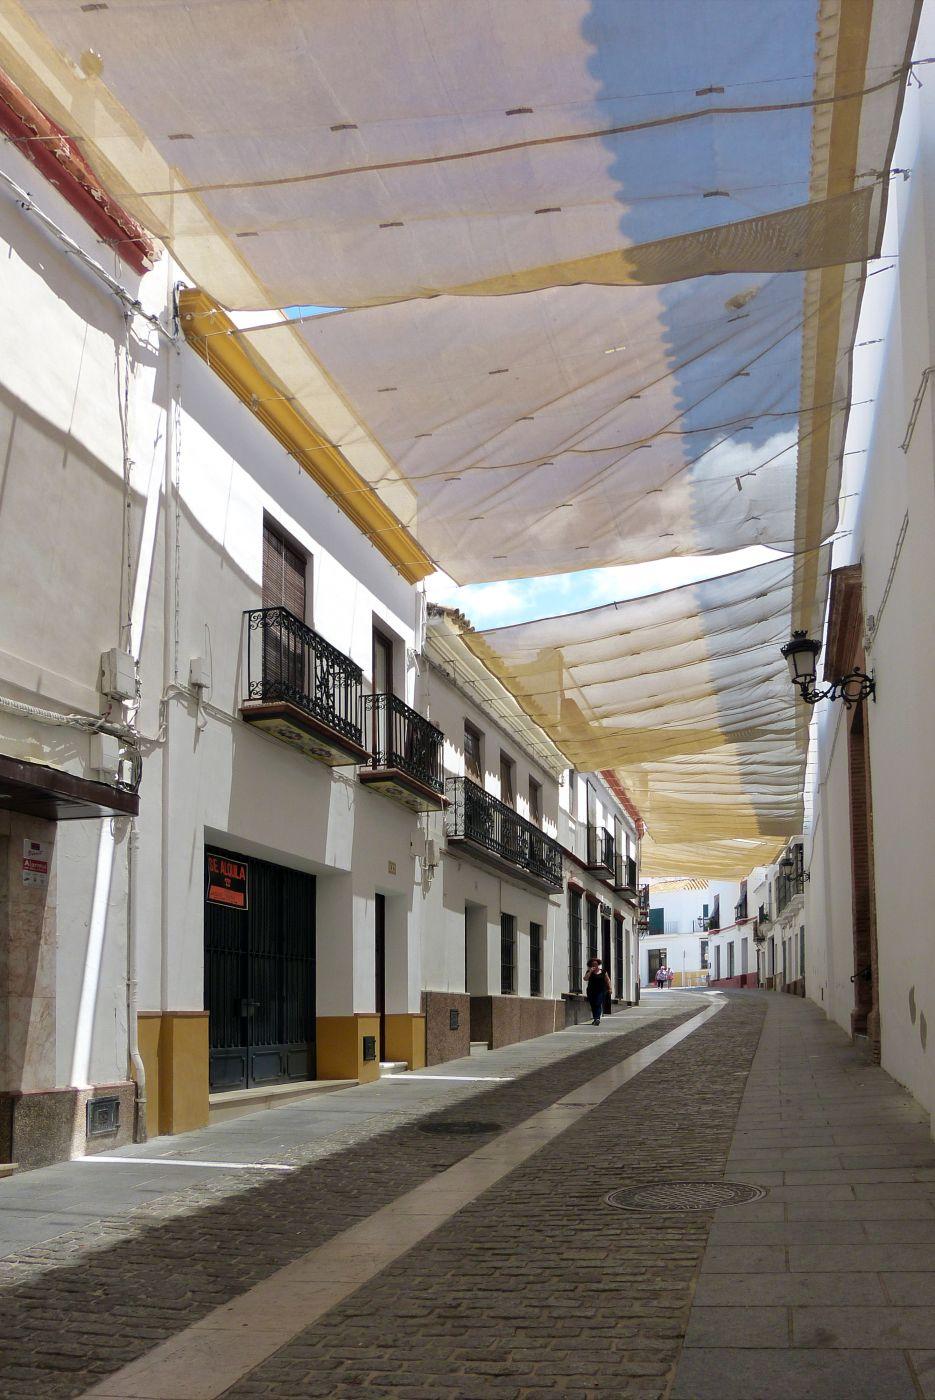 Carmona (Es), Spain